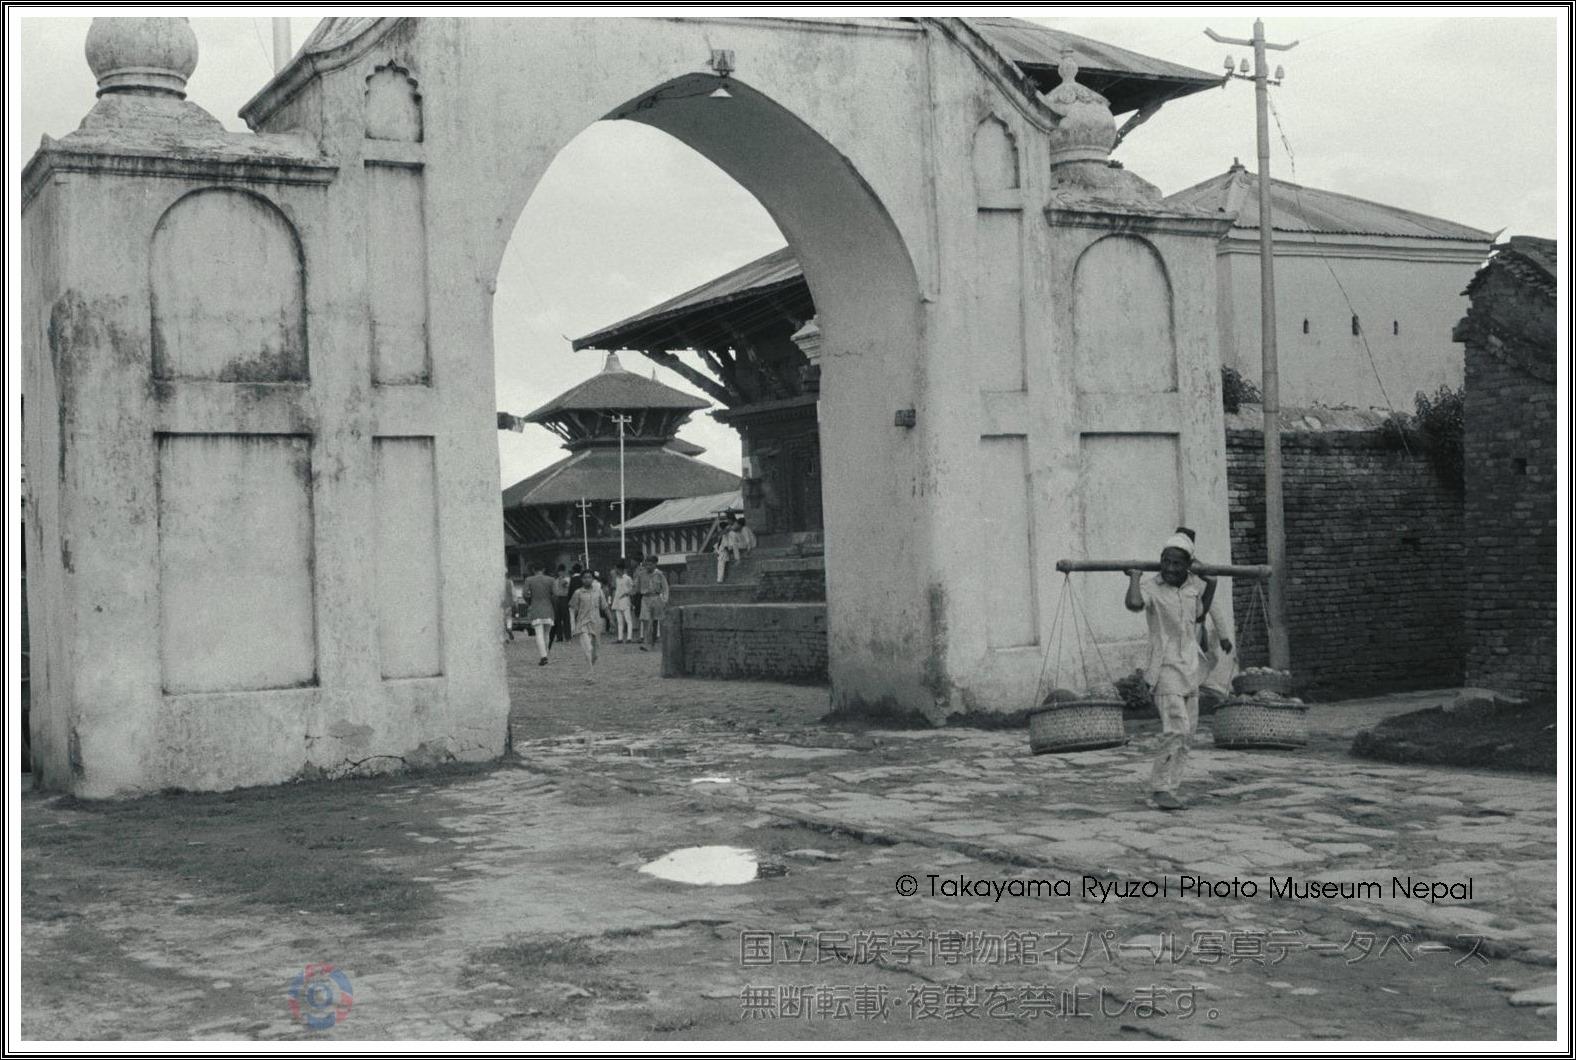 White Gate of Durbar Square image